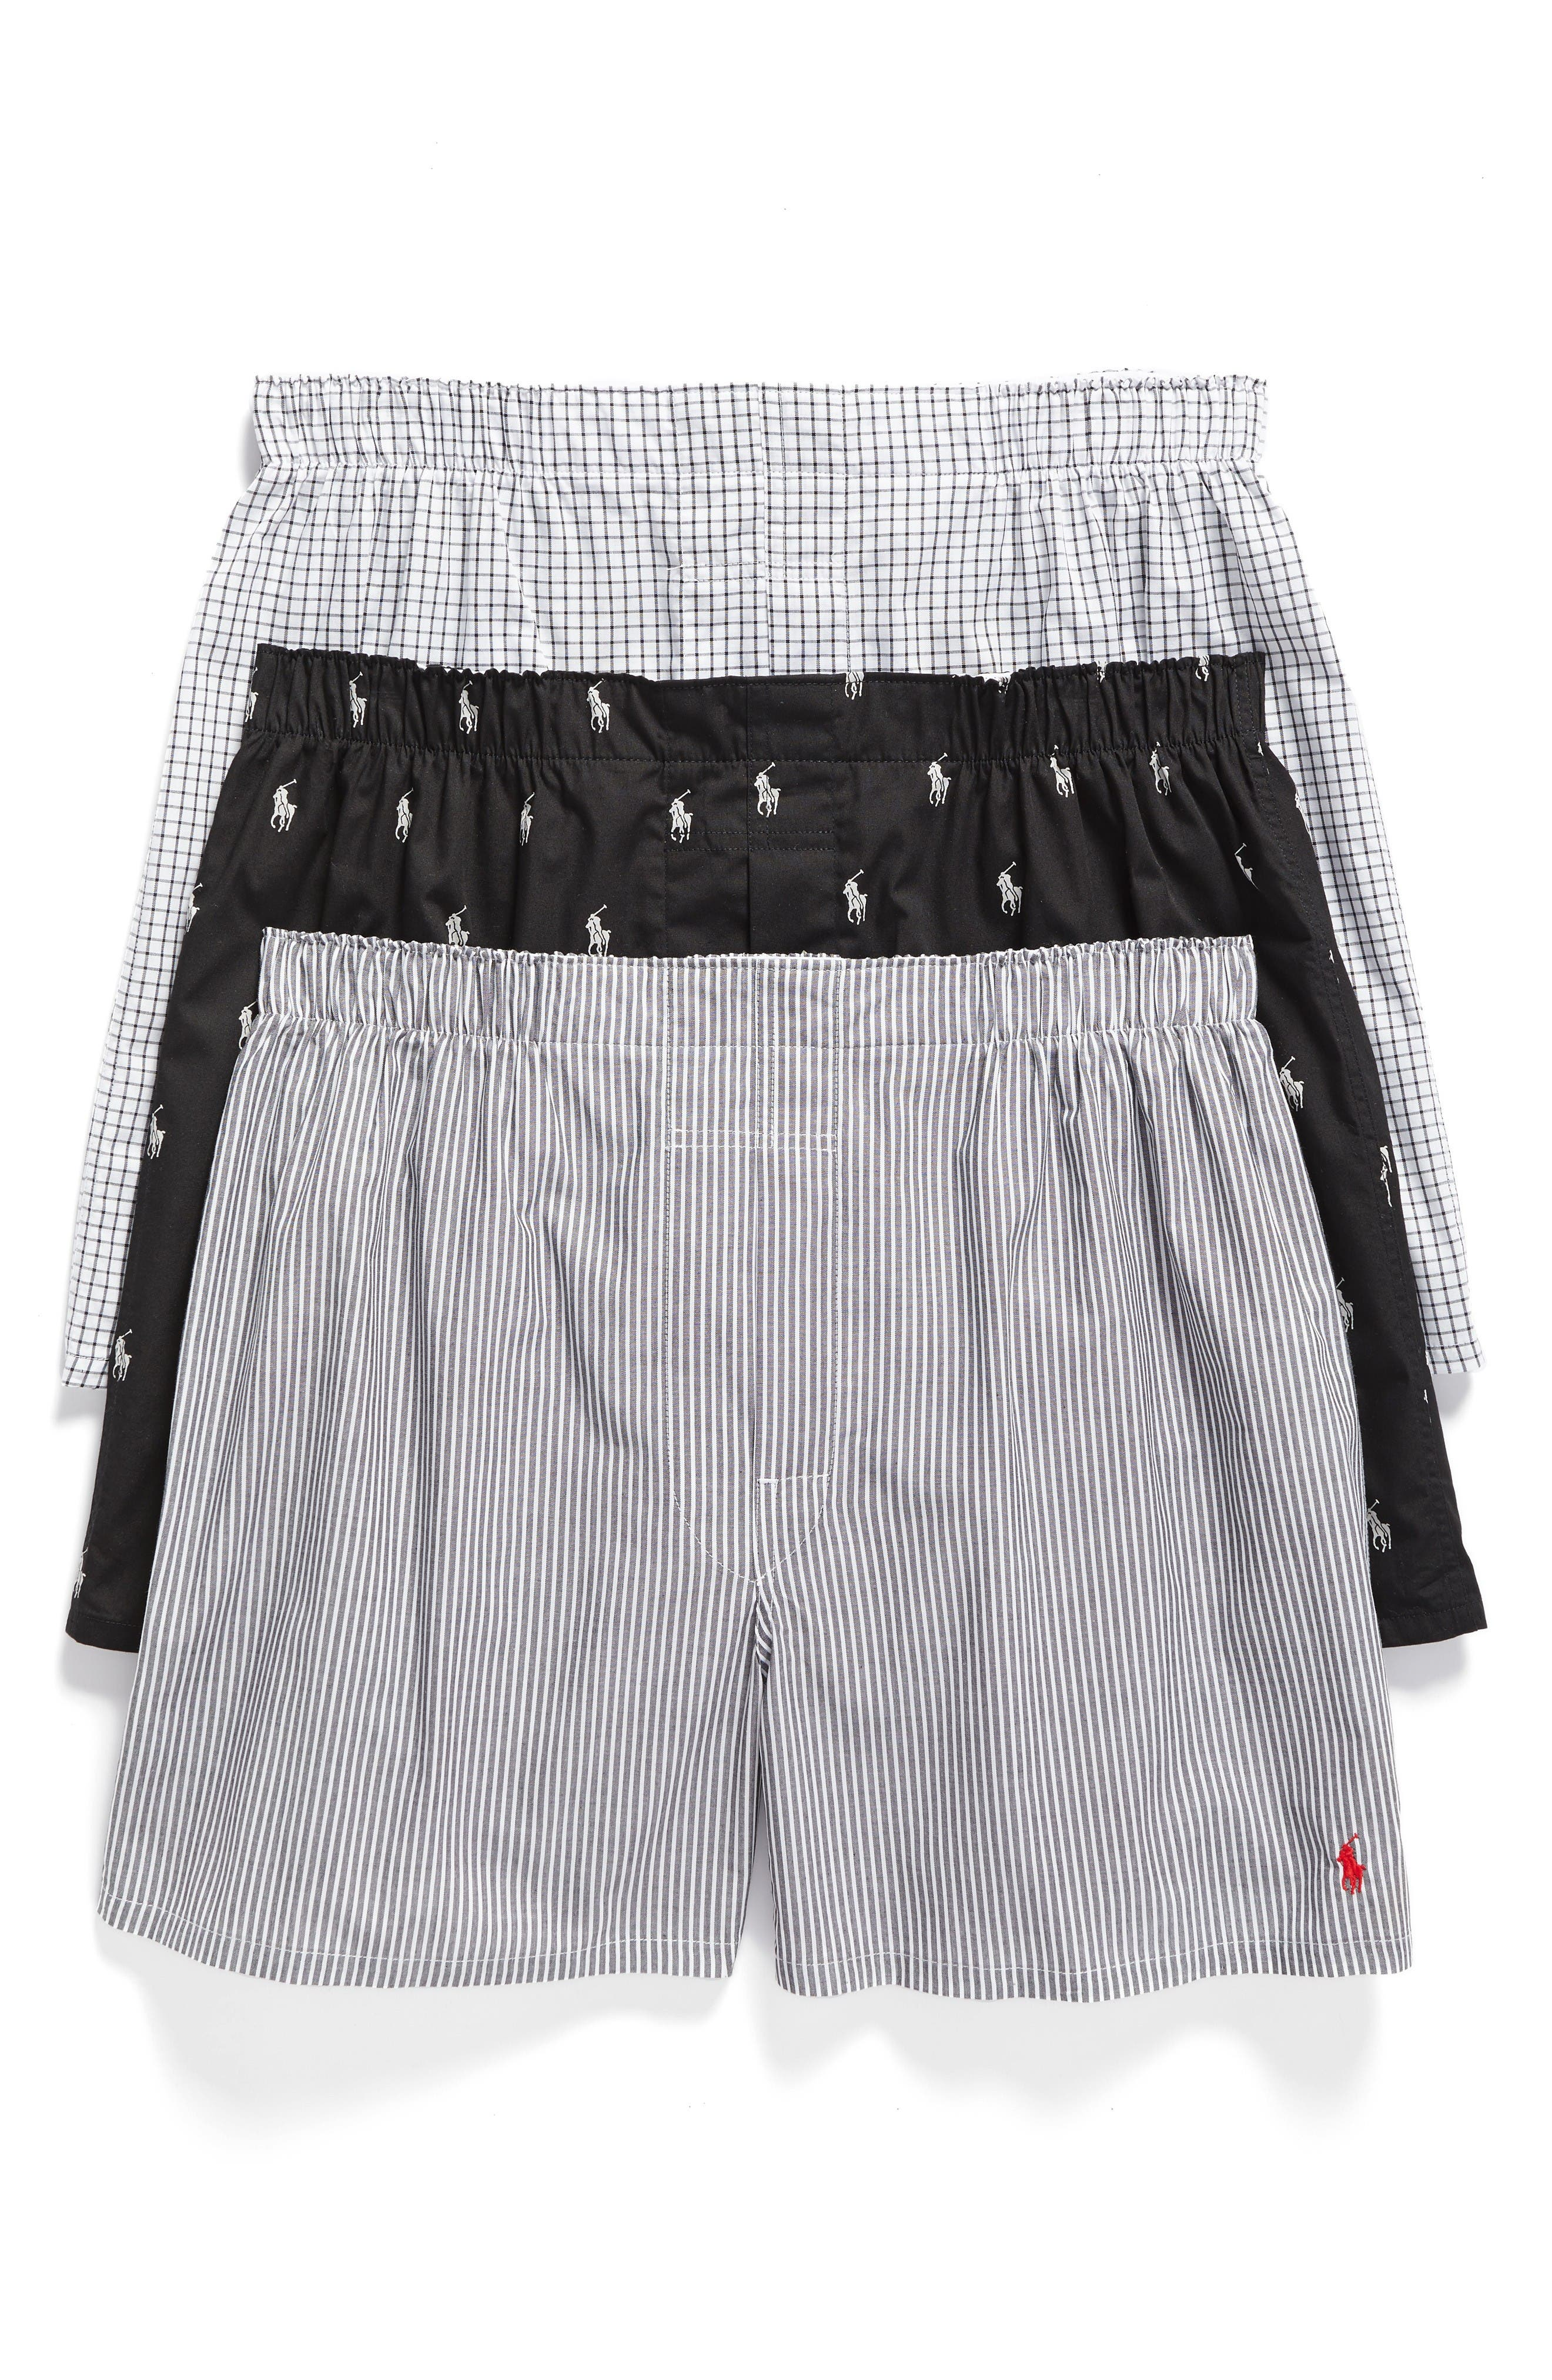 Polo Ralph Lauren 3-Pack Woven Cotton Boxers